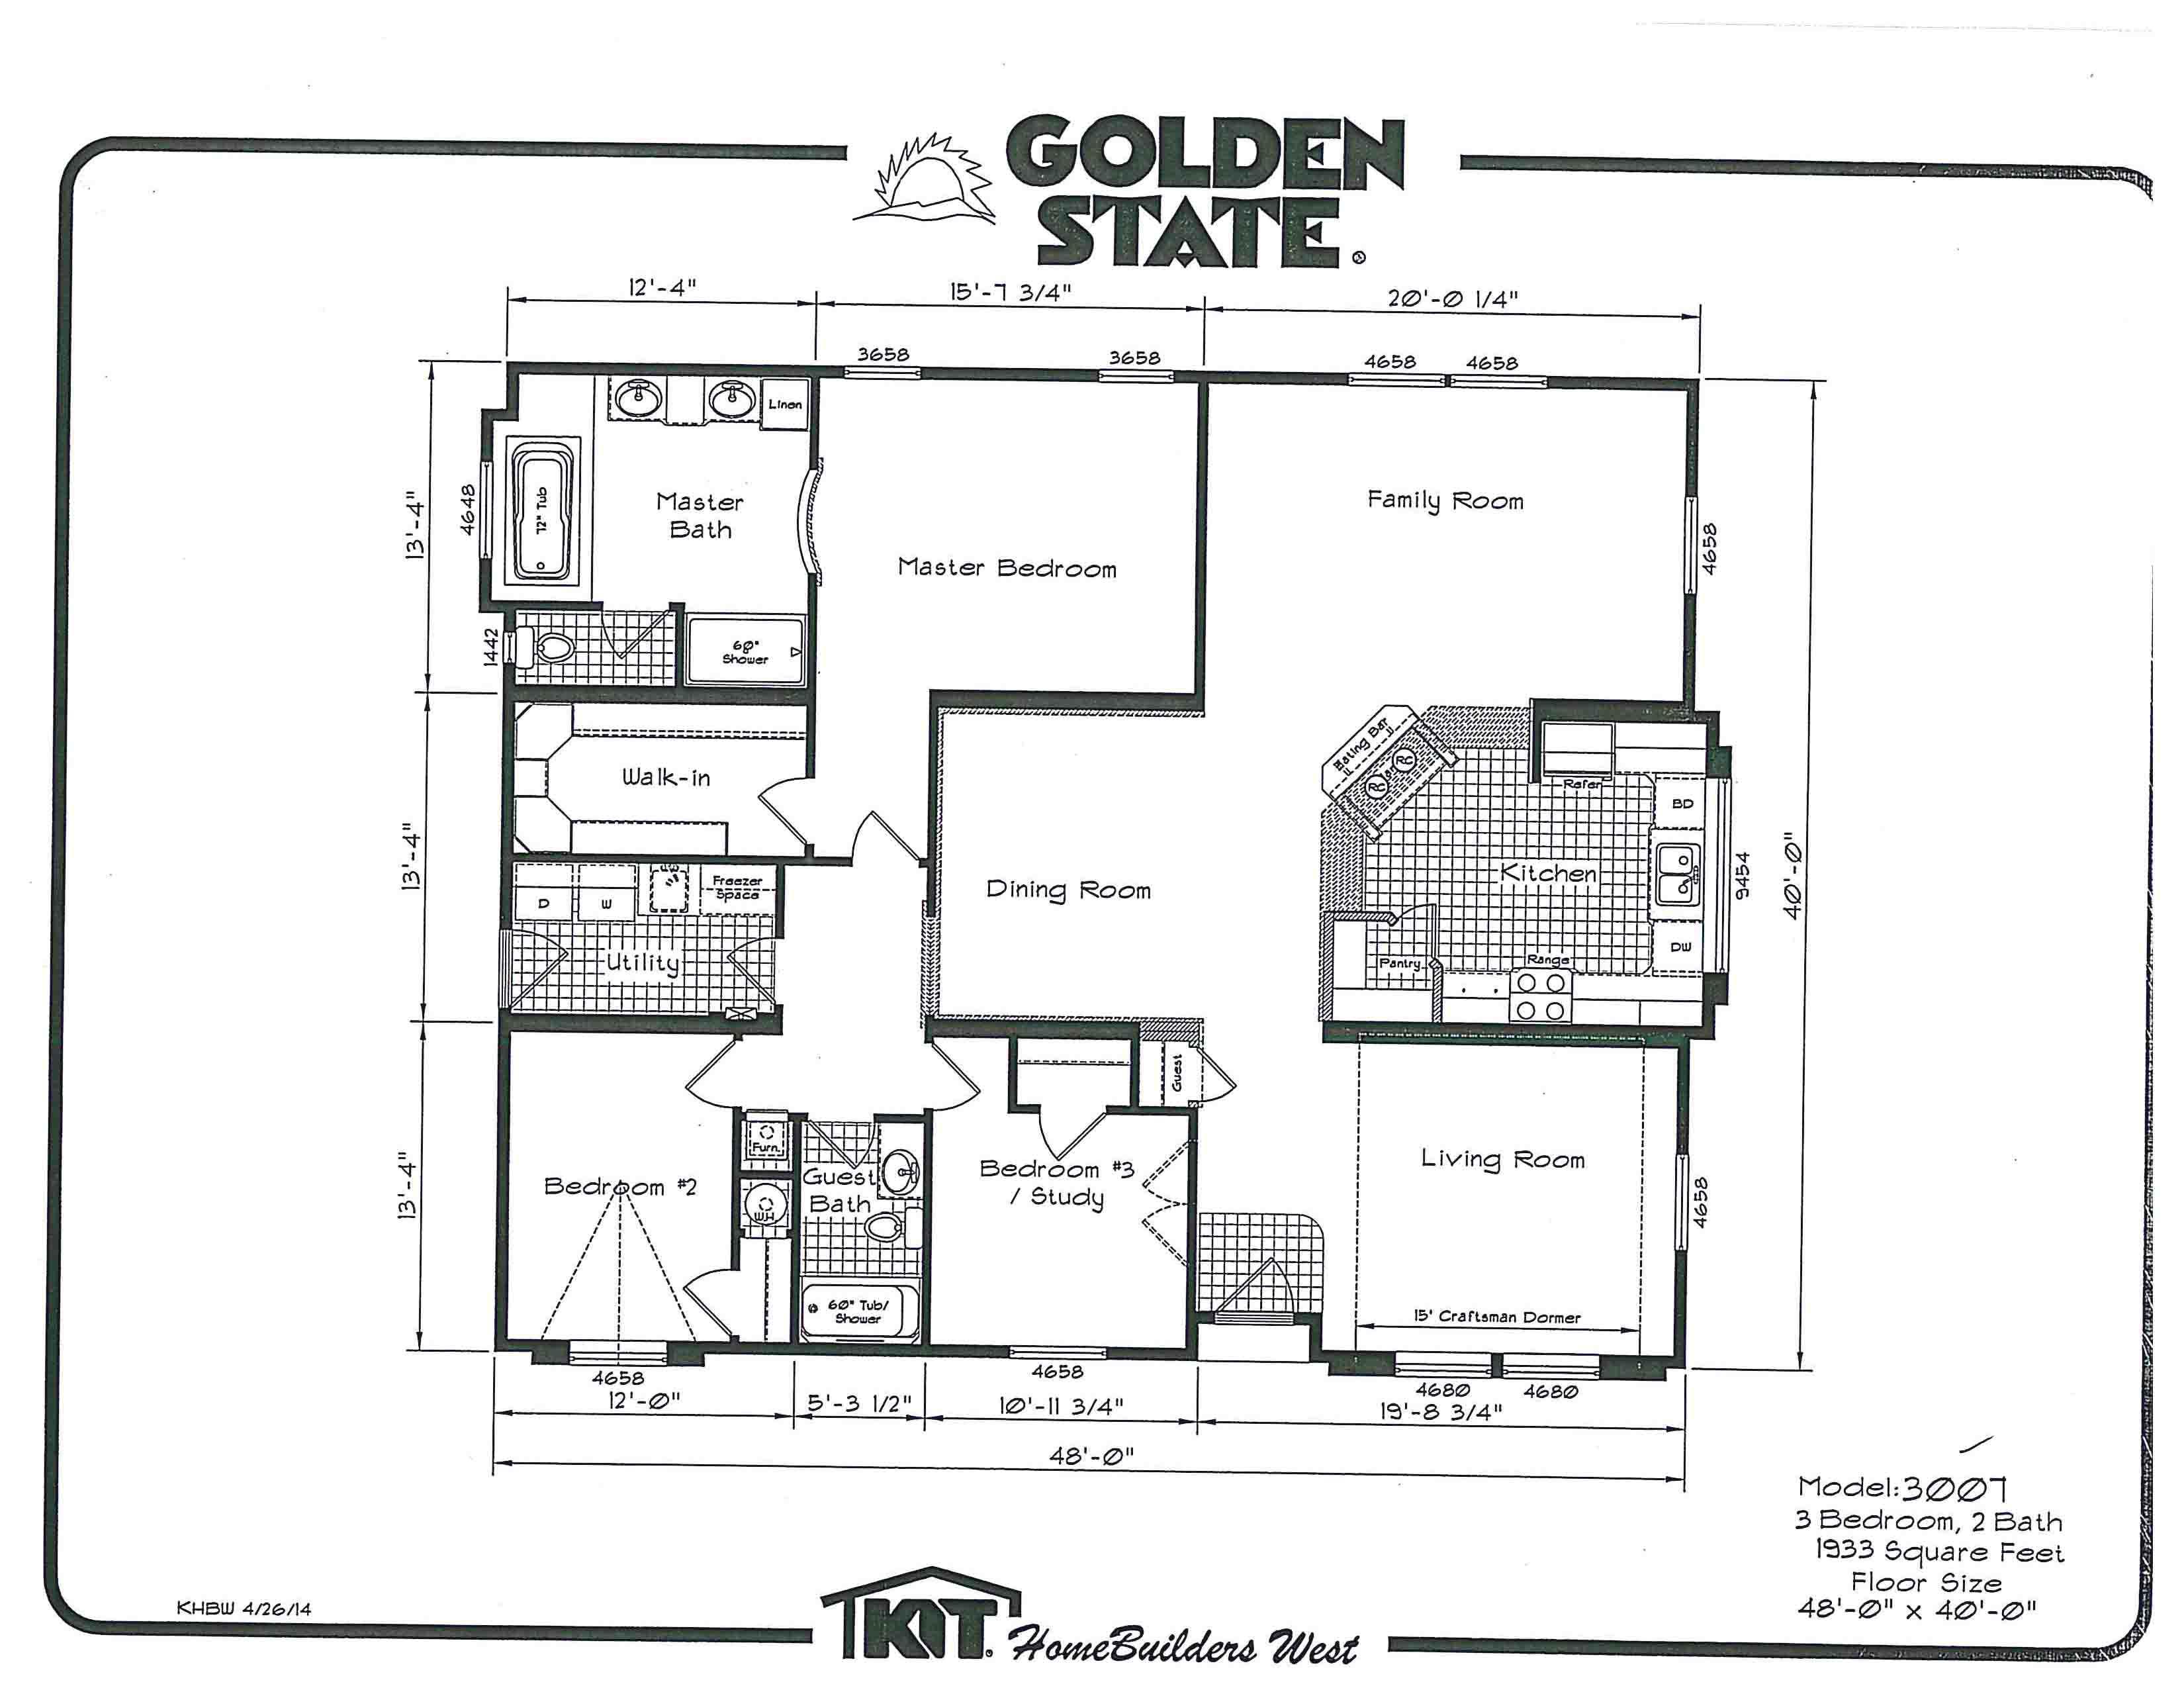 sema show 2014 floor plan show free download home plans mid century modern house plans modern house